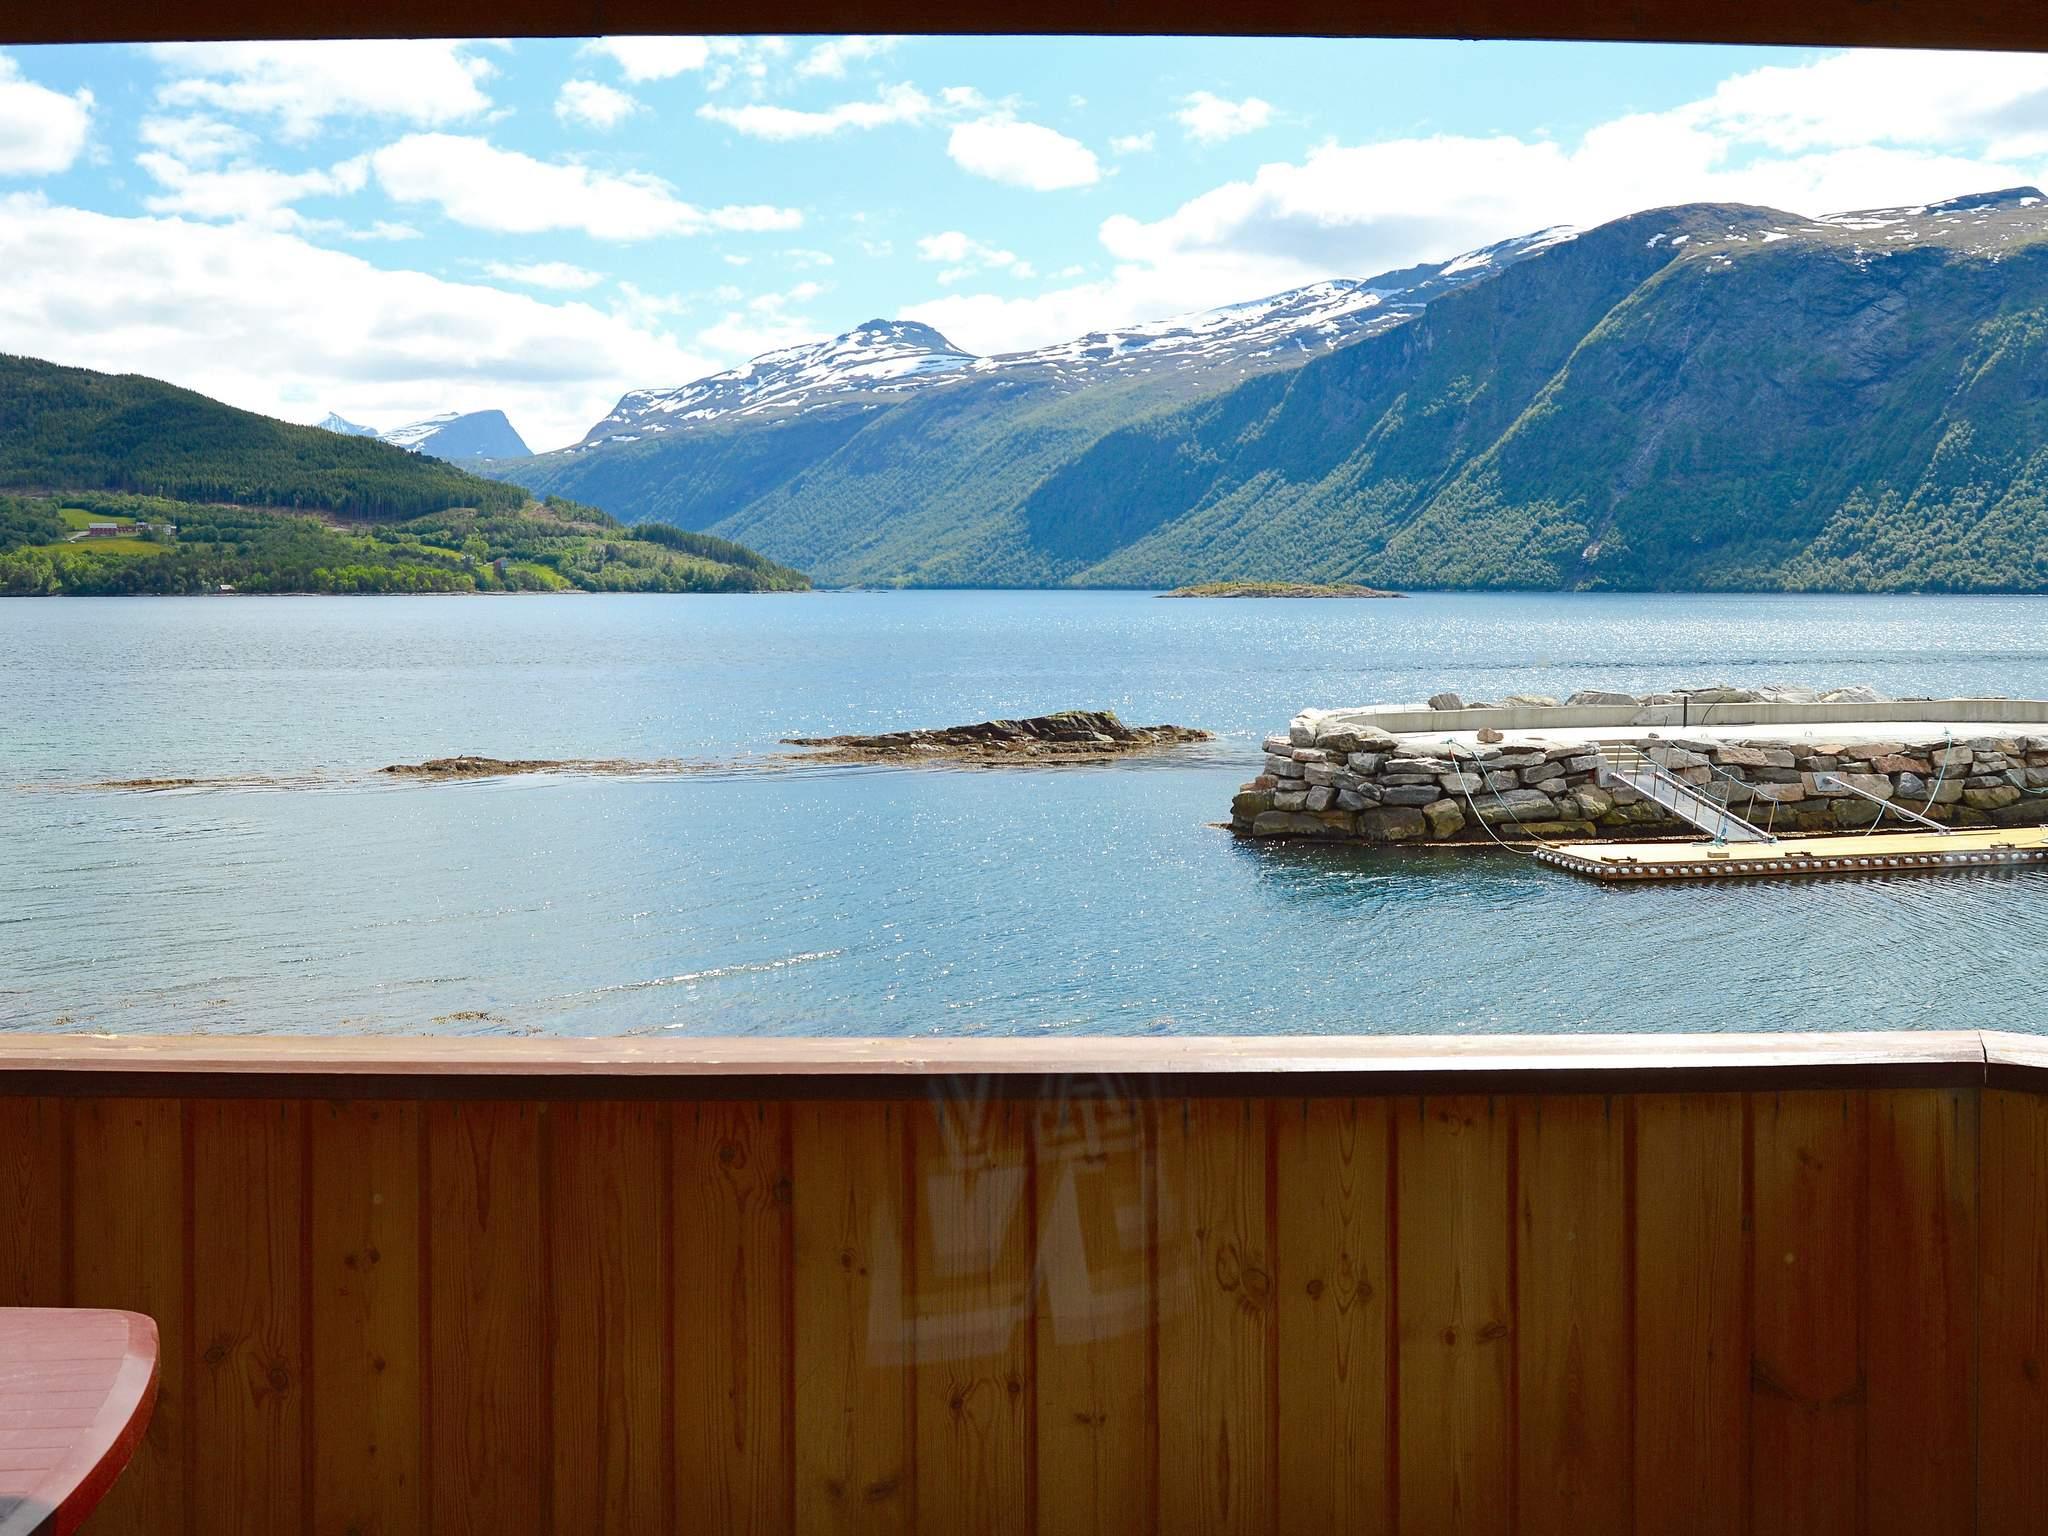 Ferienhaus Eidsvåg (84695), Eidsvåg, More - Romsdal, Westnorwegen, Norwegen, Bild 50